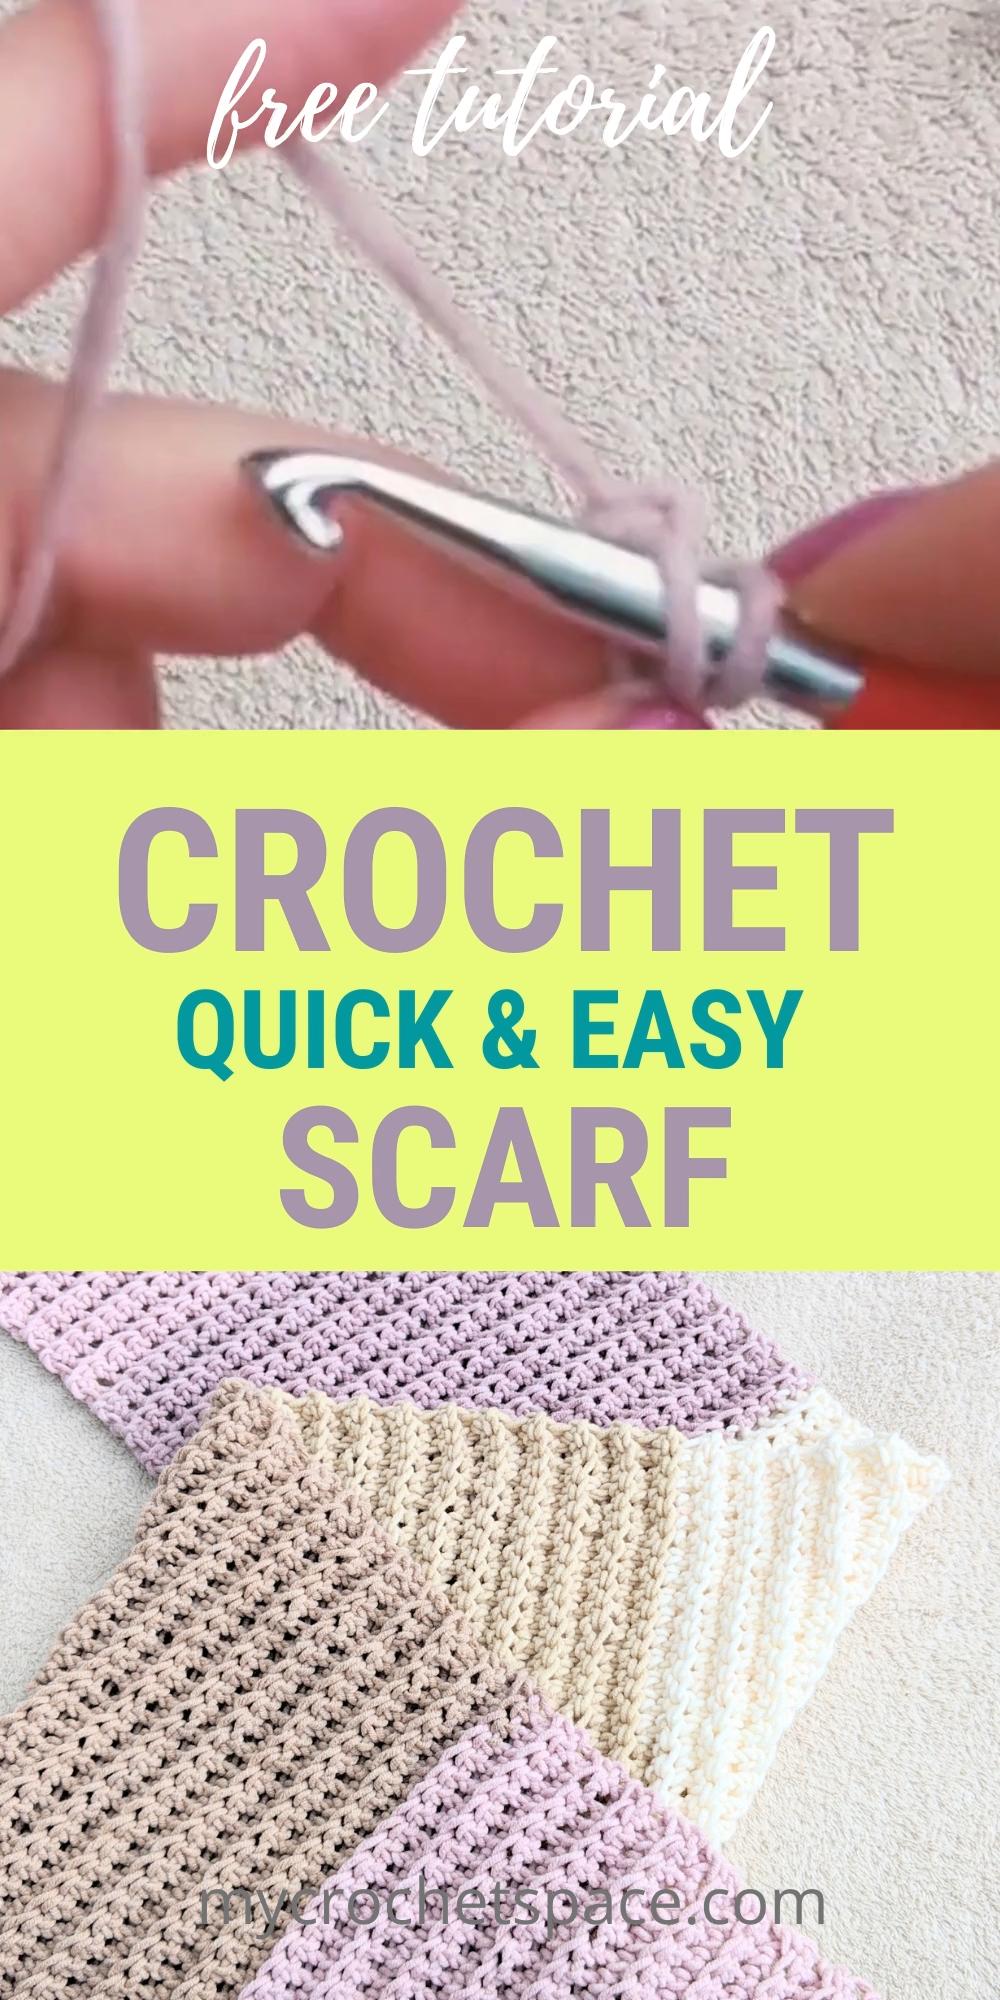 CROCHET RIBBED SCARF - beginner friendly free pattern